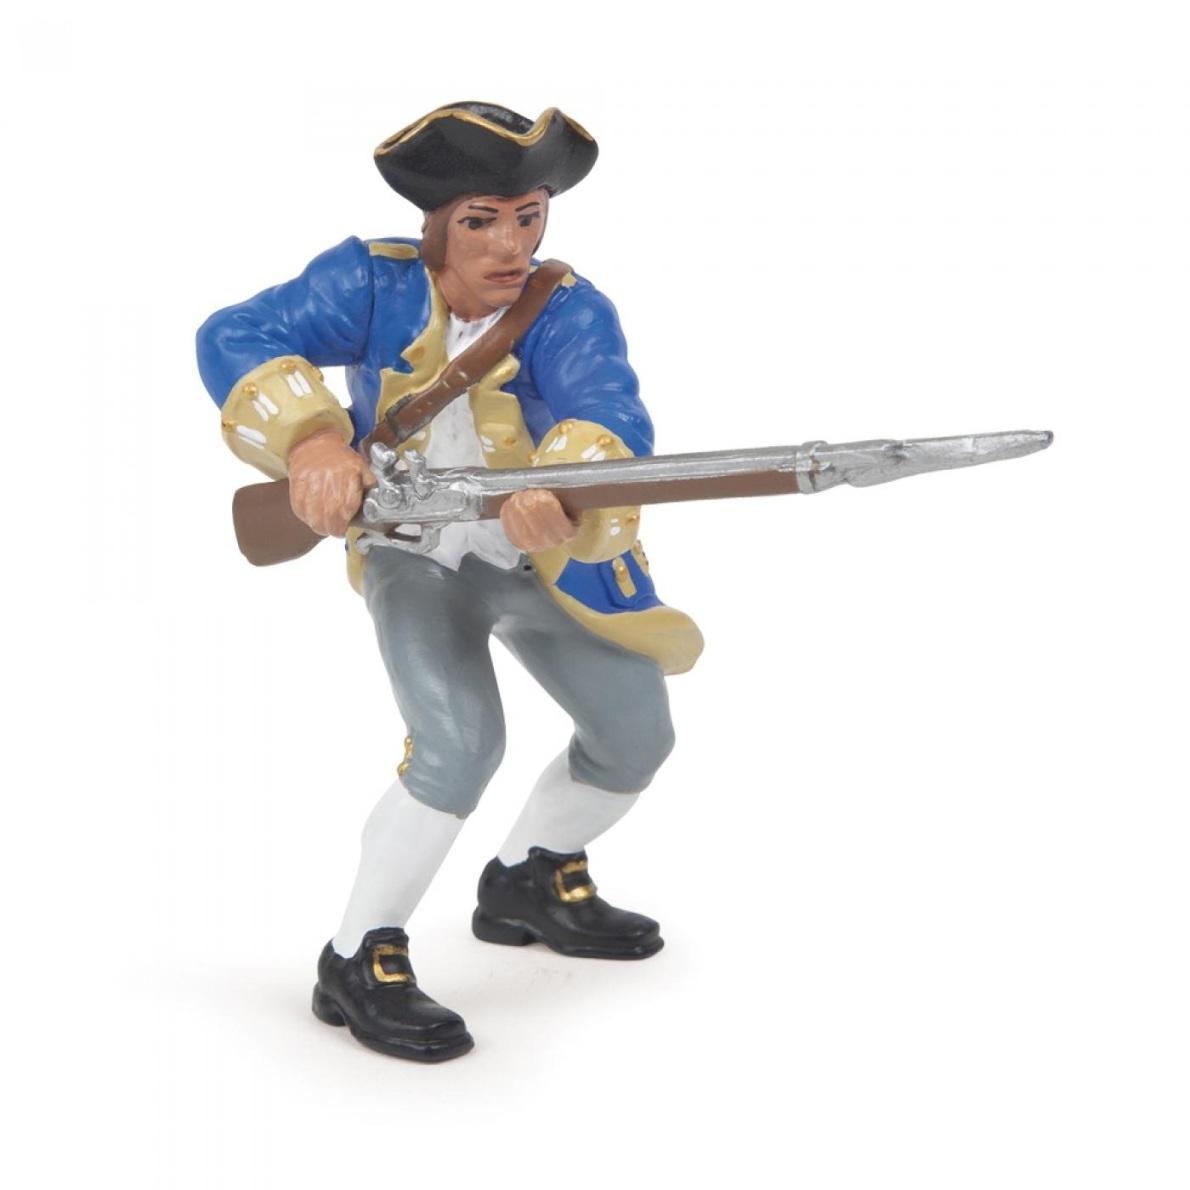 Фигурка игрушечная корабельного гардемаринаФигурки Papo<br>Фигурка игрушечная корабельного гардемарина<br>